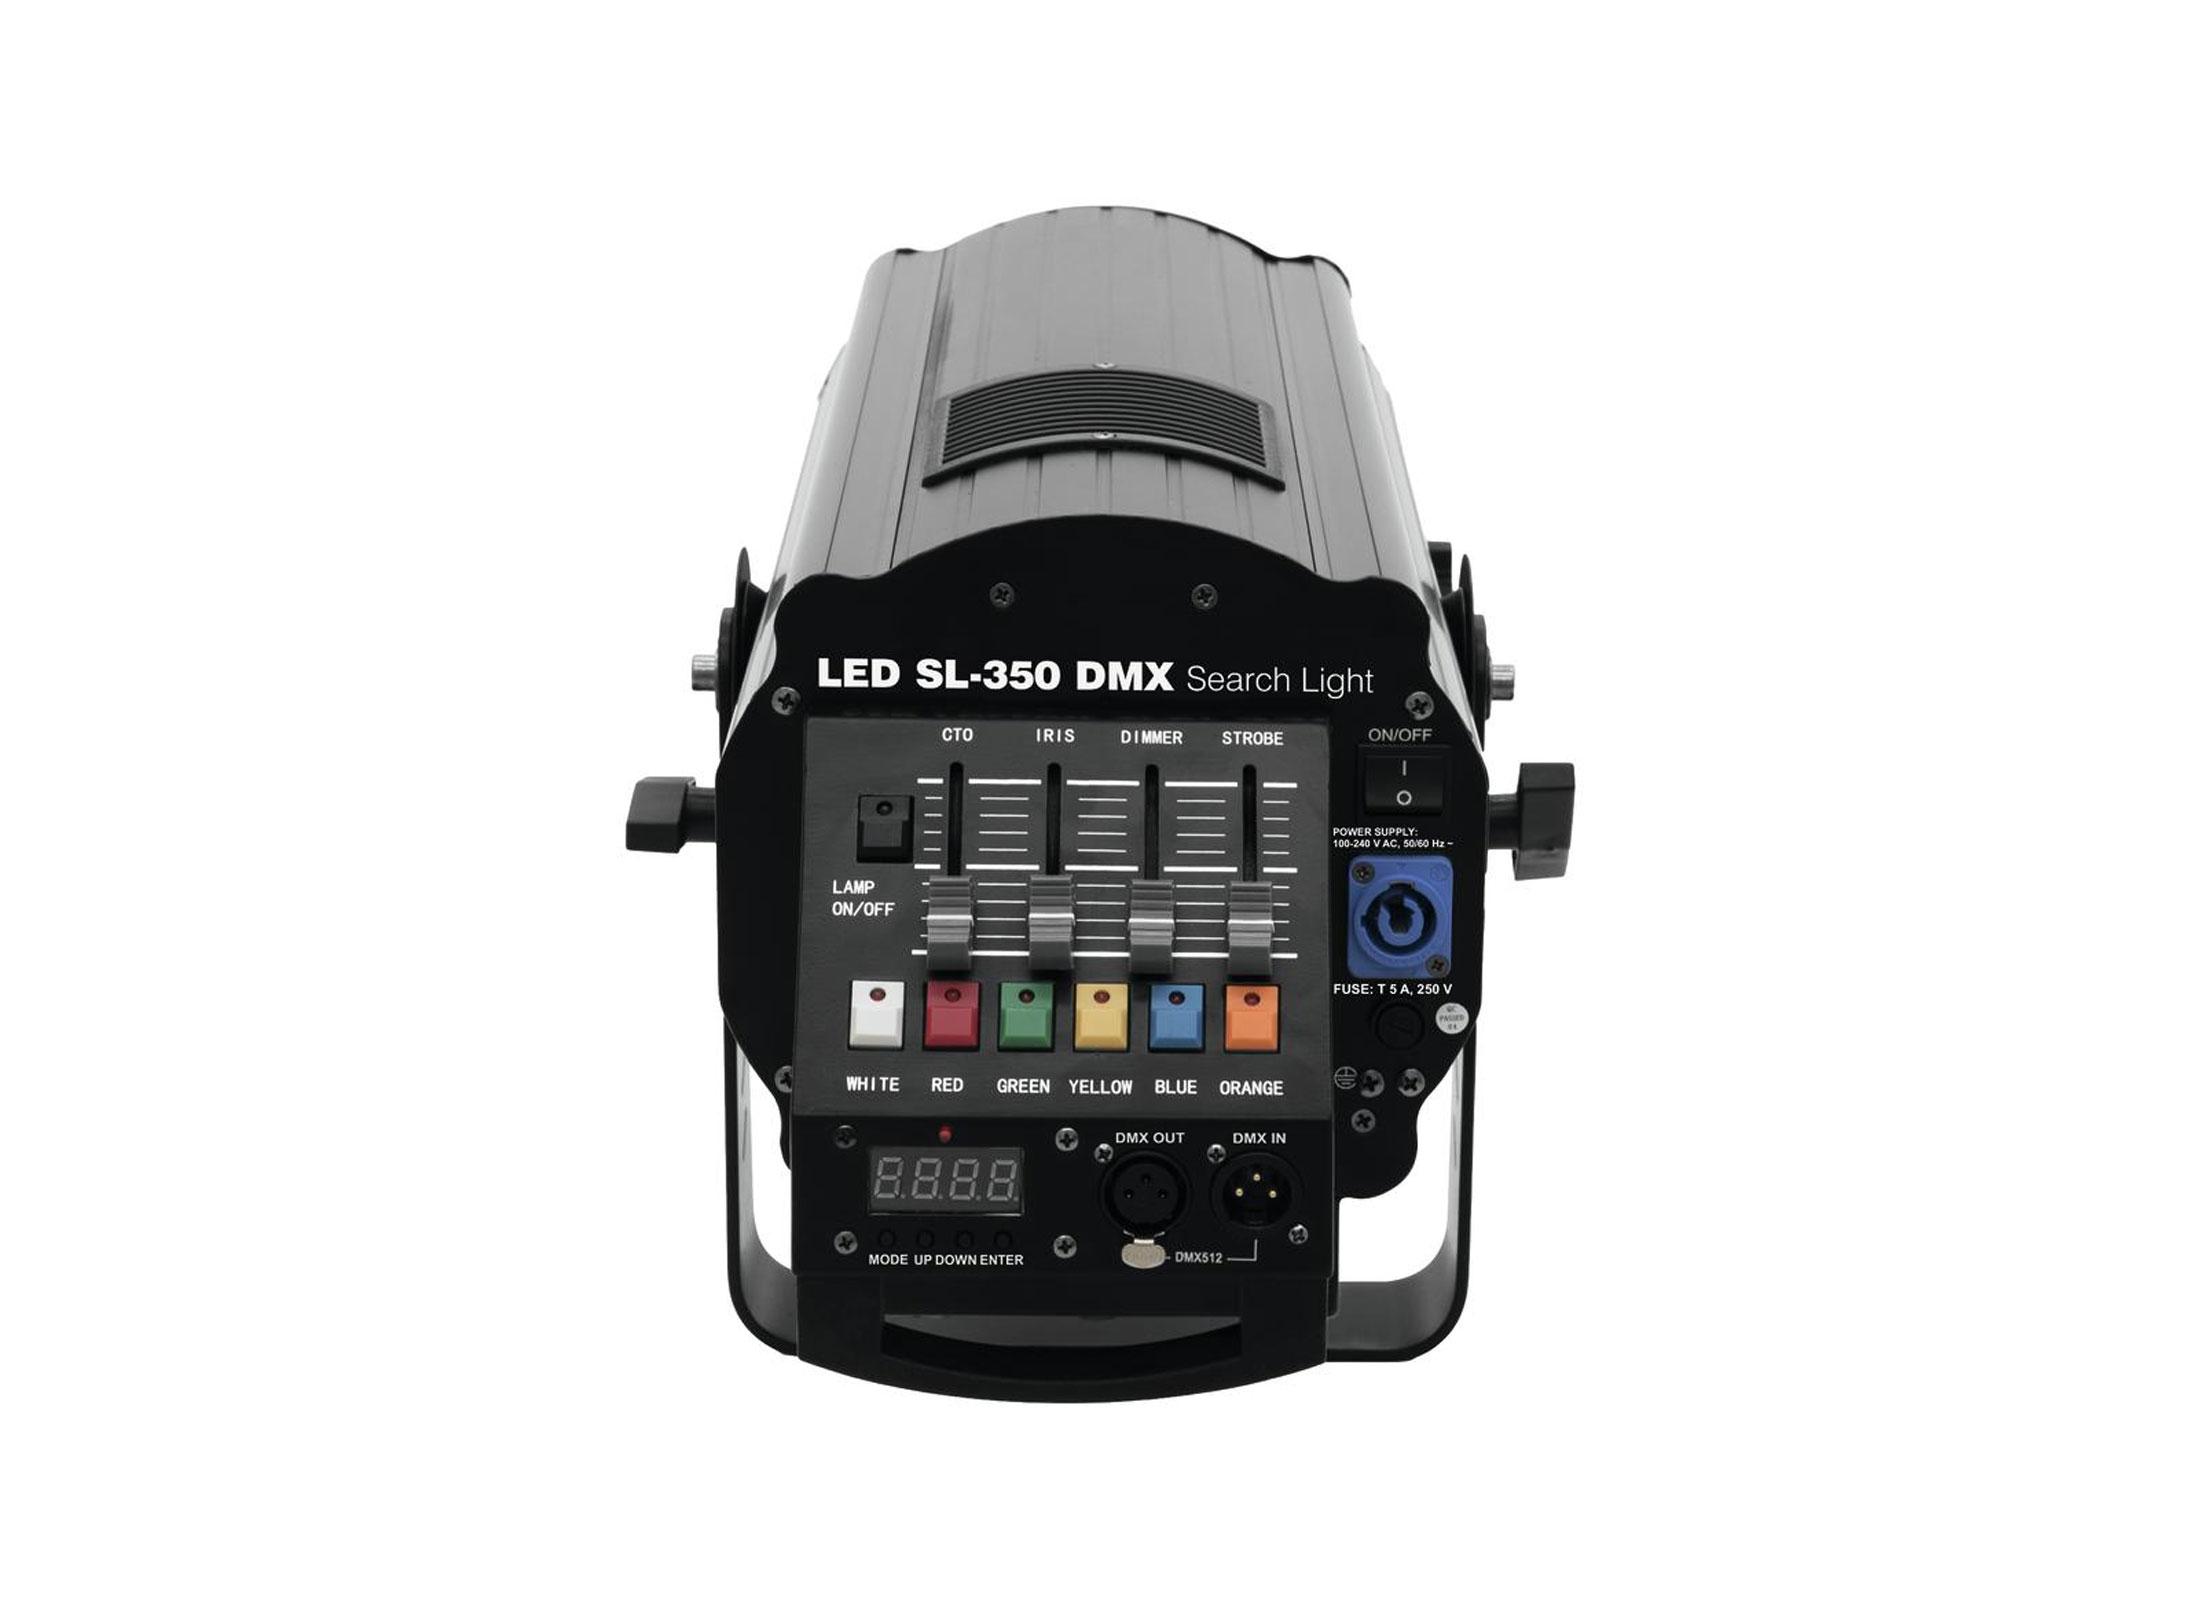 Eurolite SL-350 DMX LED Followspot Online At Low Prices At Huss ...